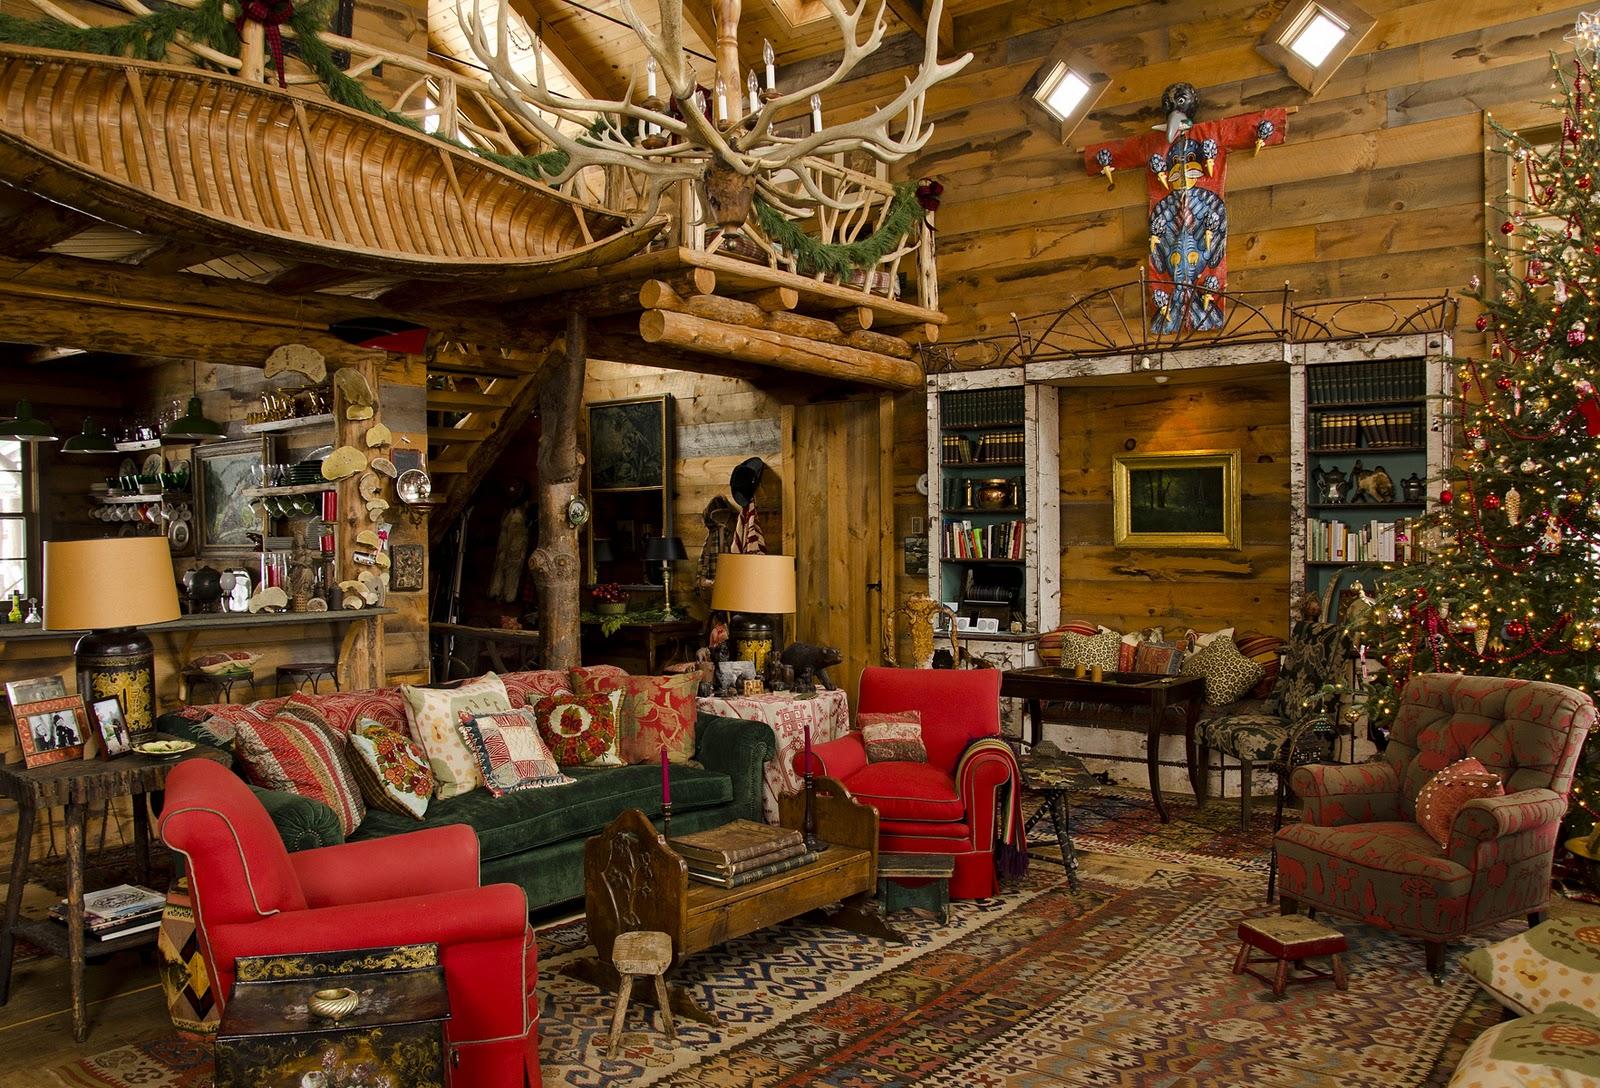 New home interior design wonders of wild wild west - New home interior design ...